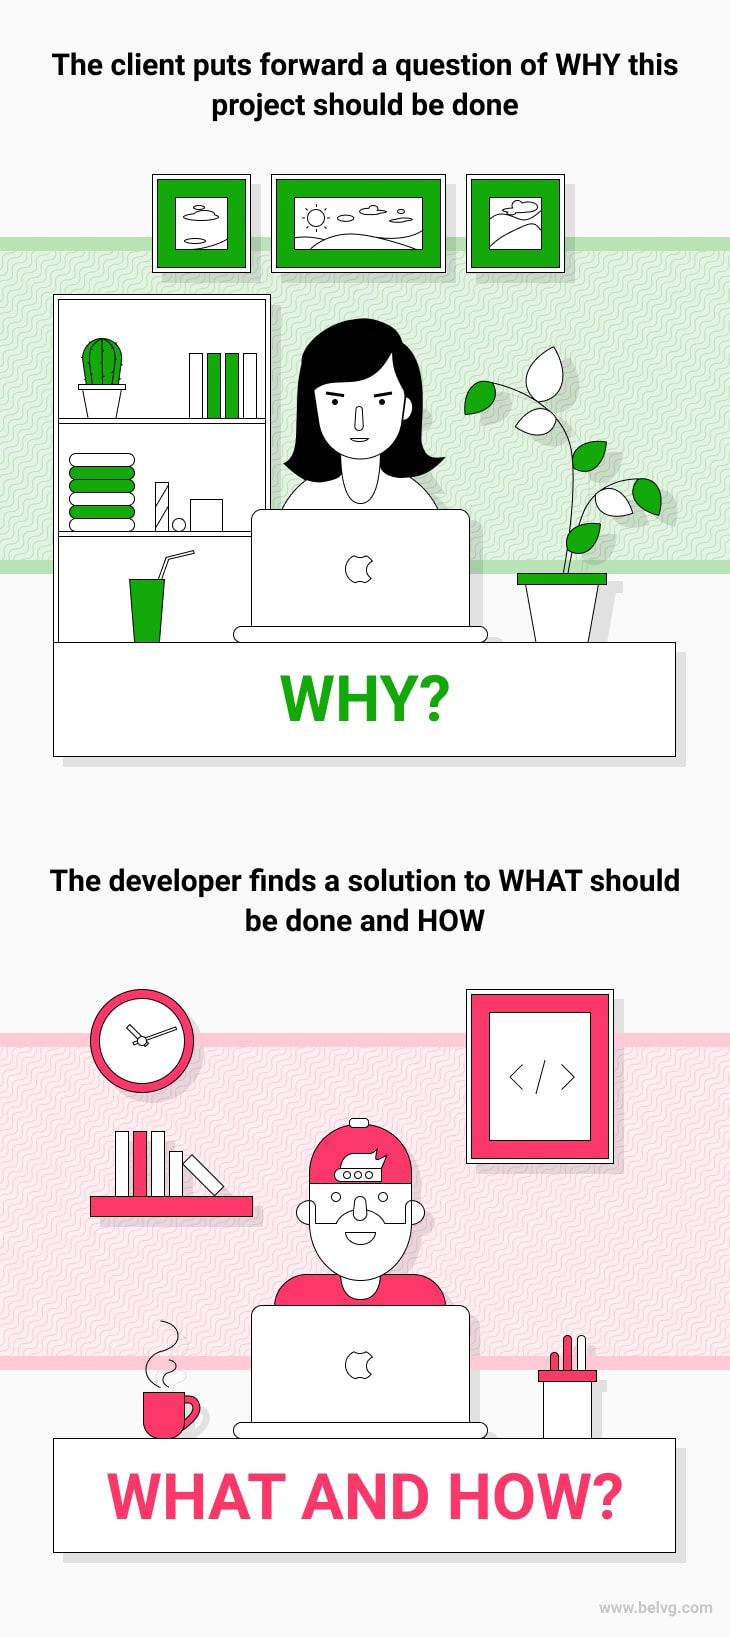 web development belvg - infographic